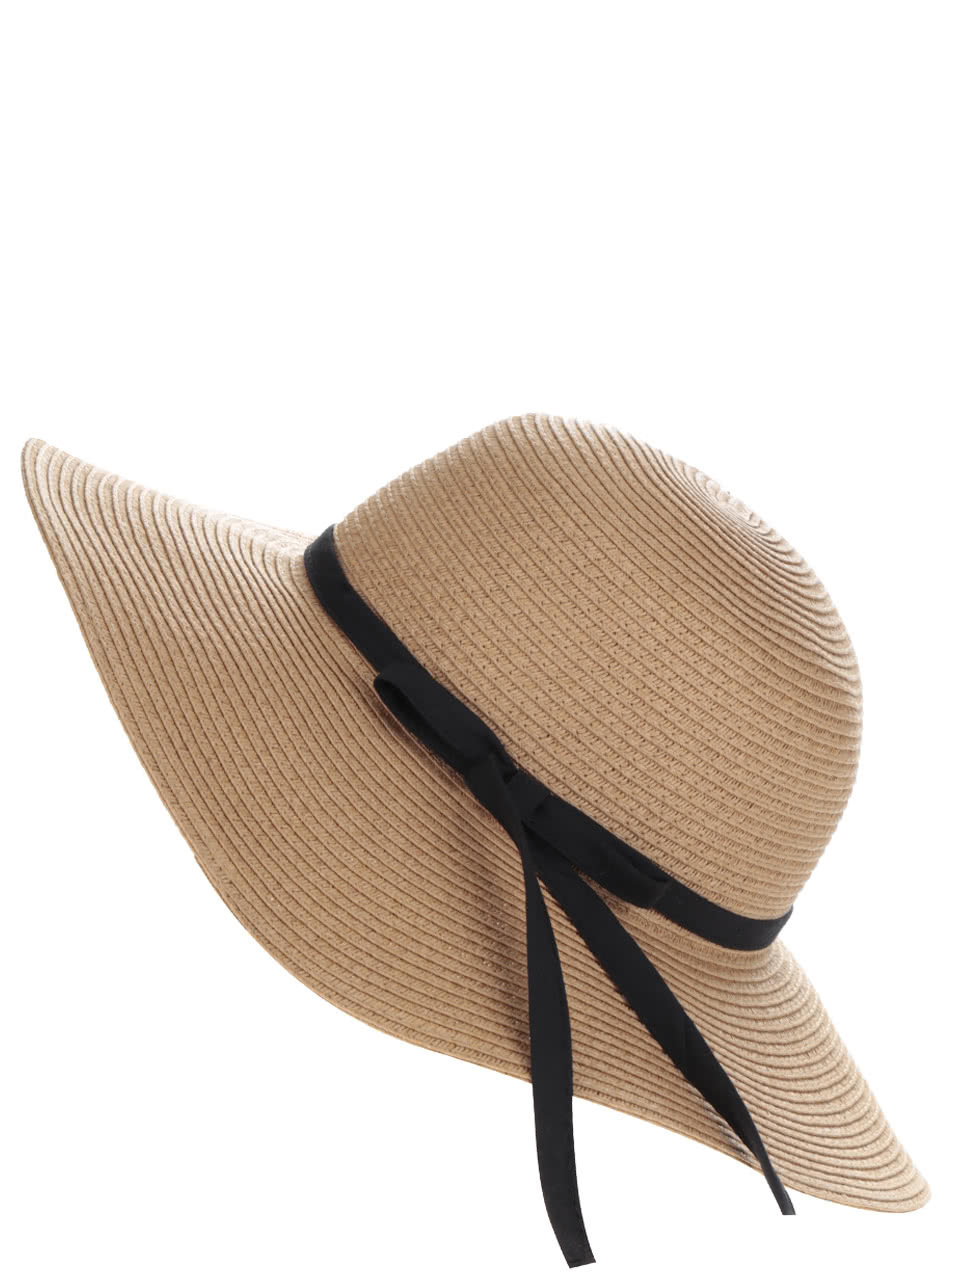 ad966b775 Svetlohnedý klobúk s mašľou Pieces Lele   ZOOT.sk